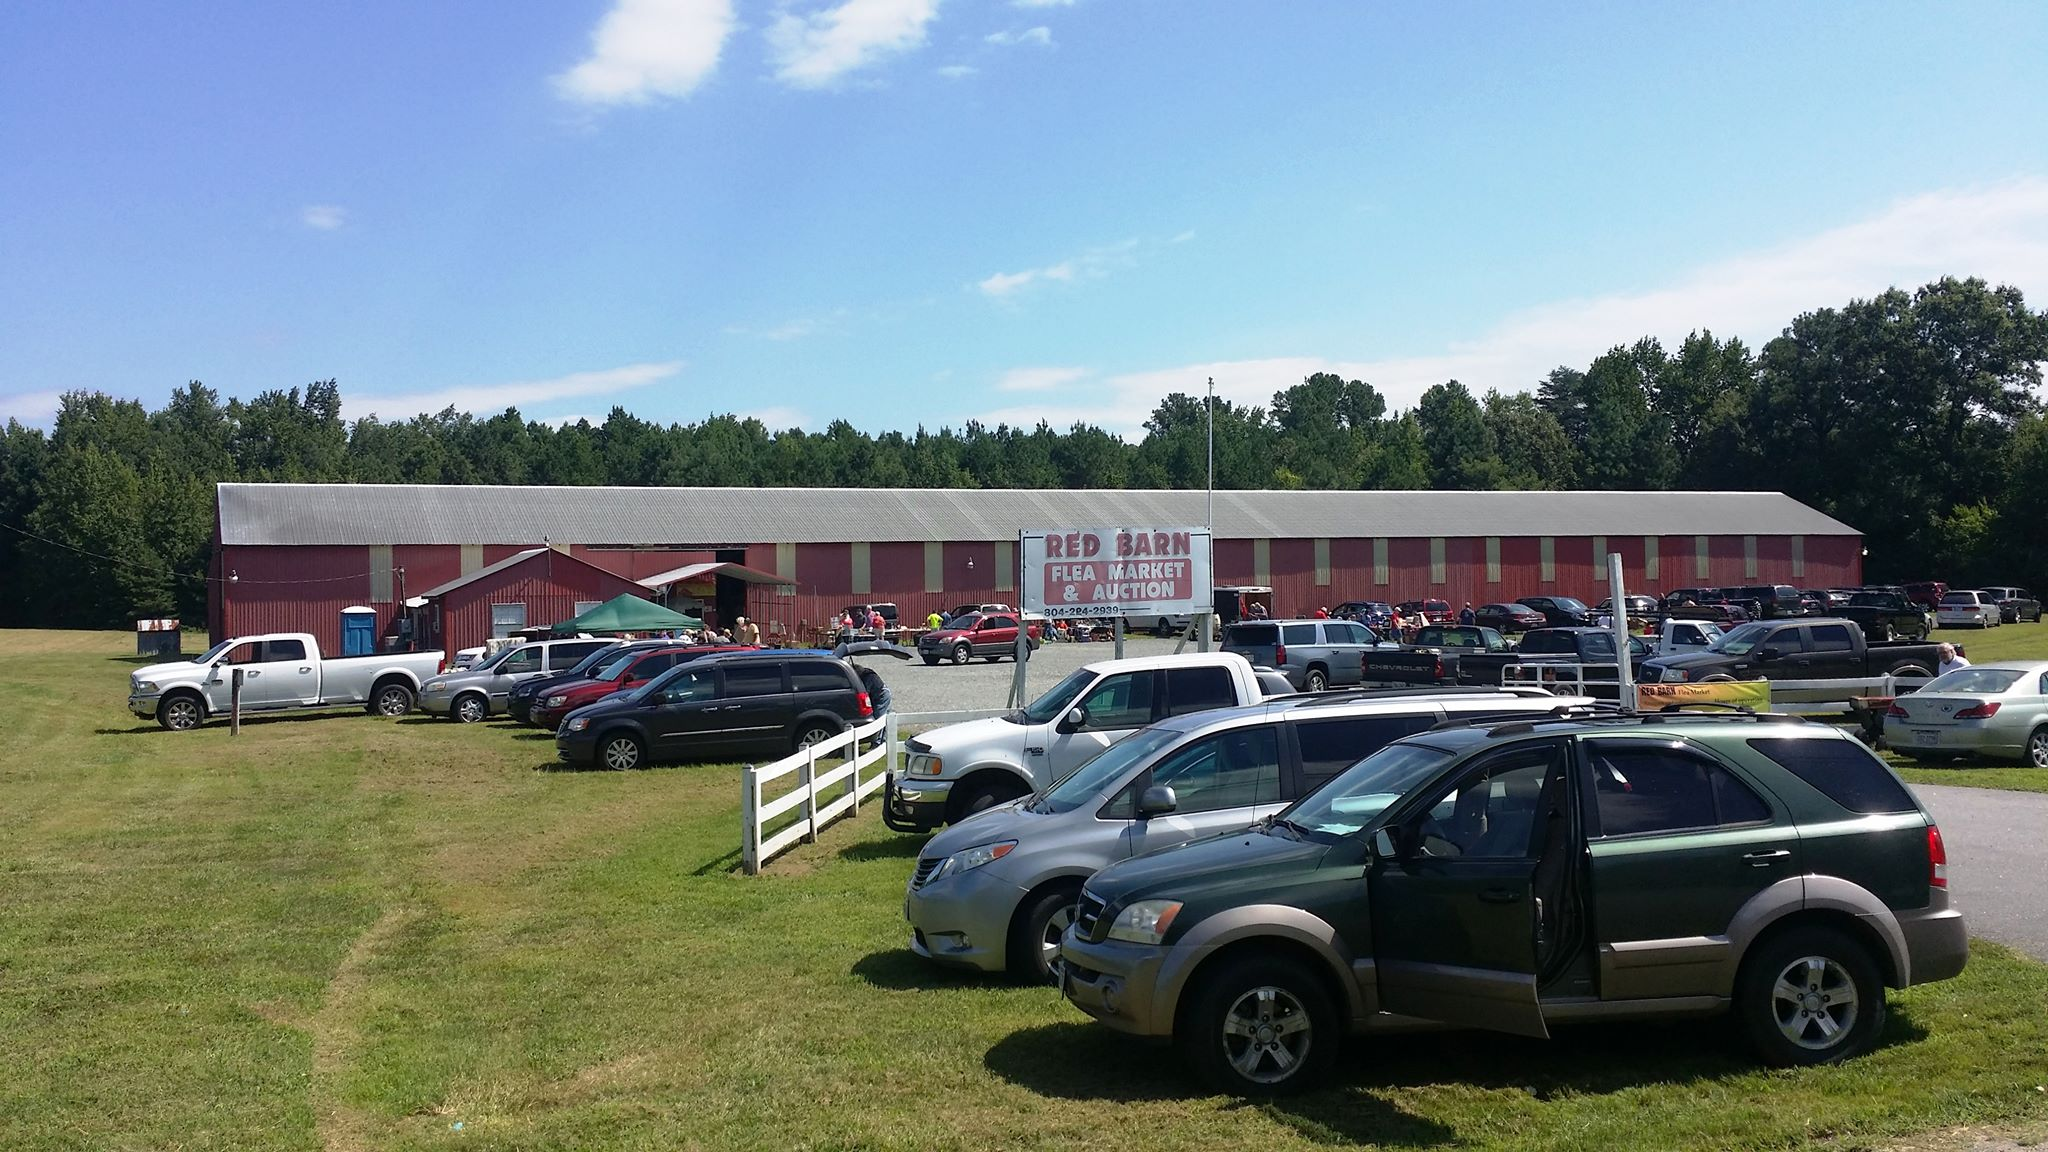 Big Outdoor Yard Sale in Northern Neck, Virginia